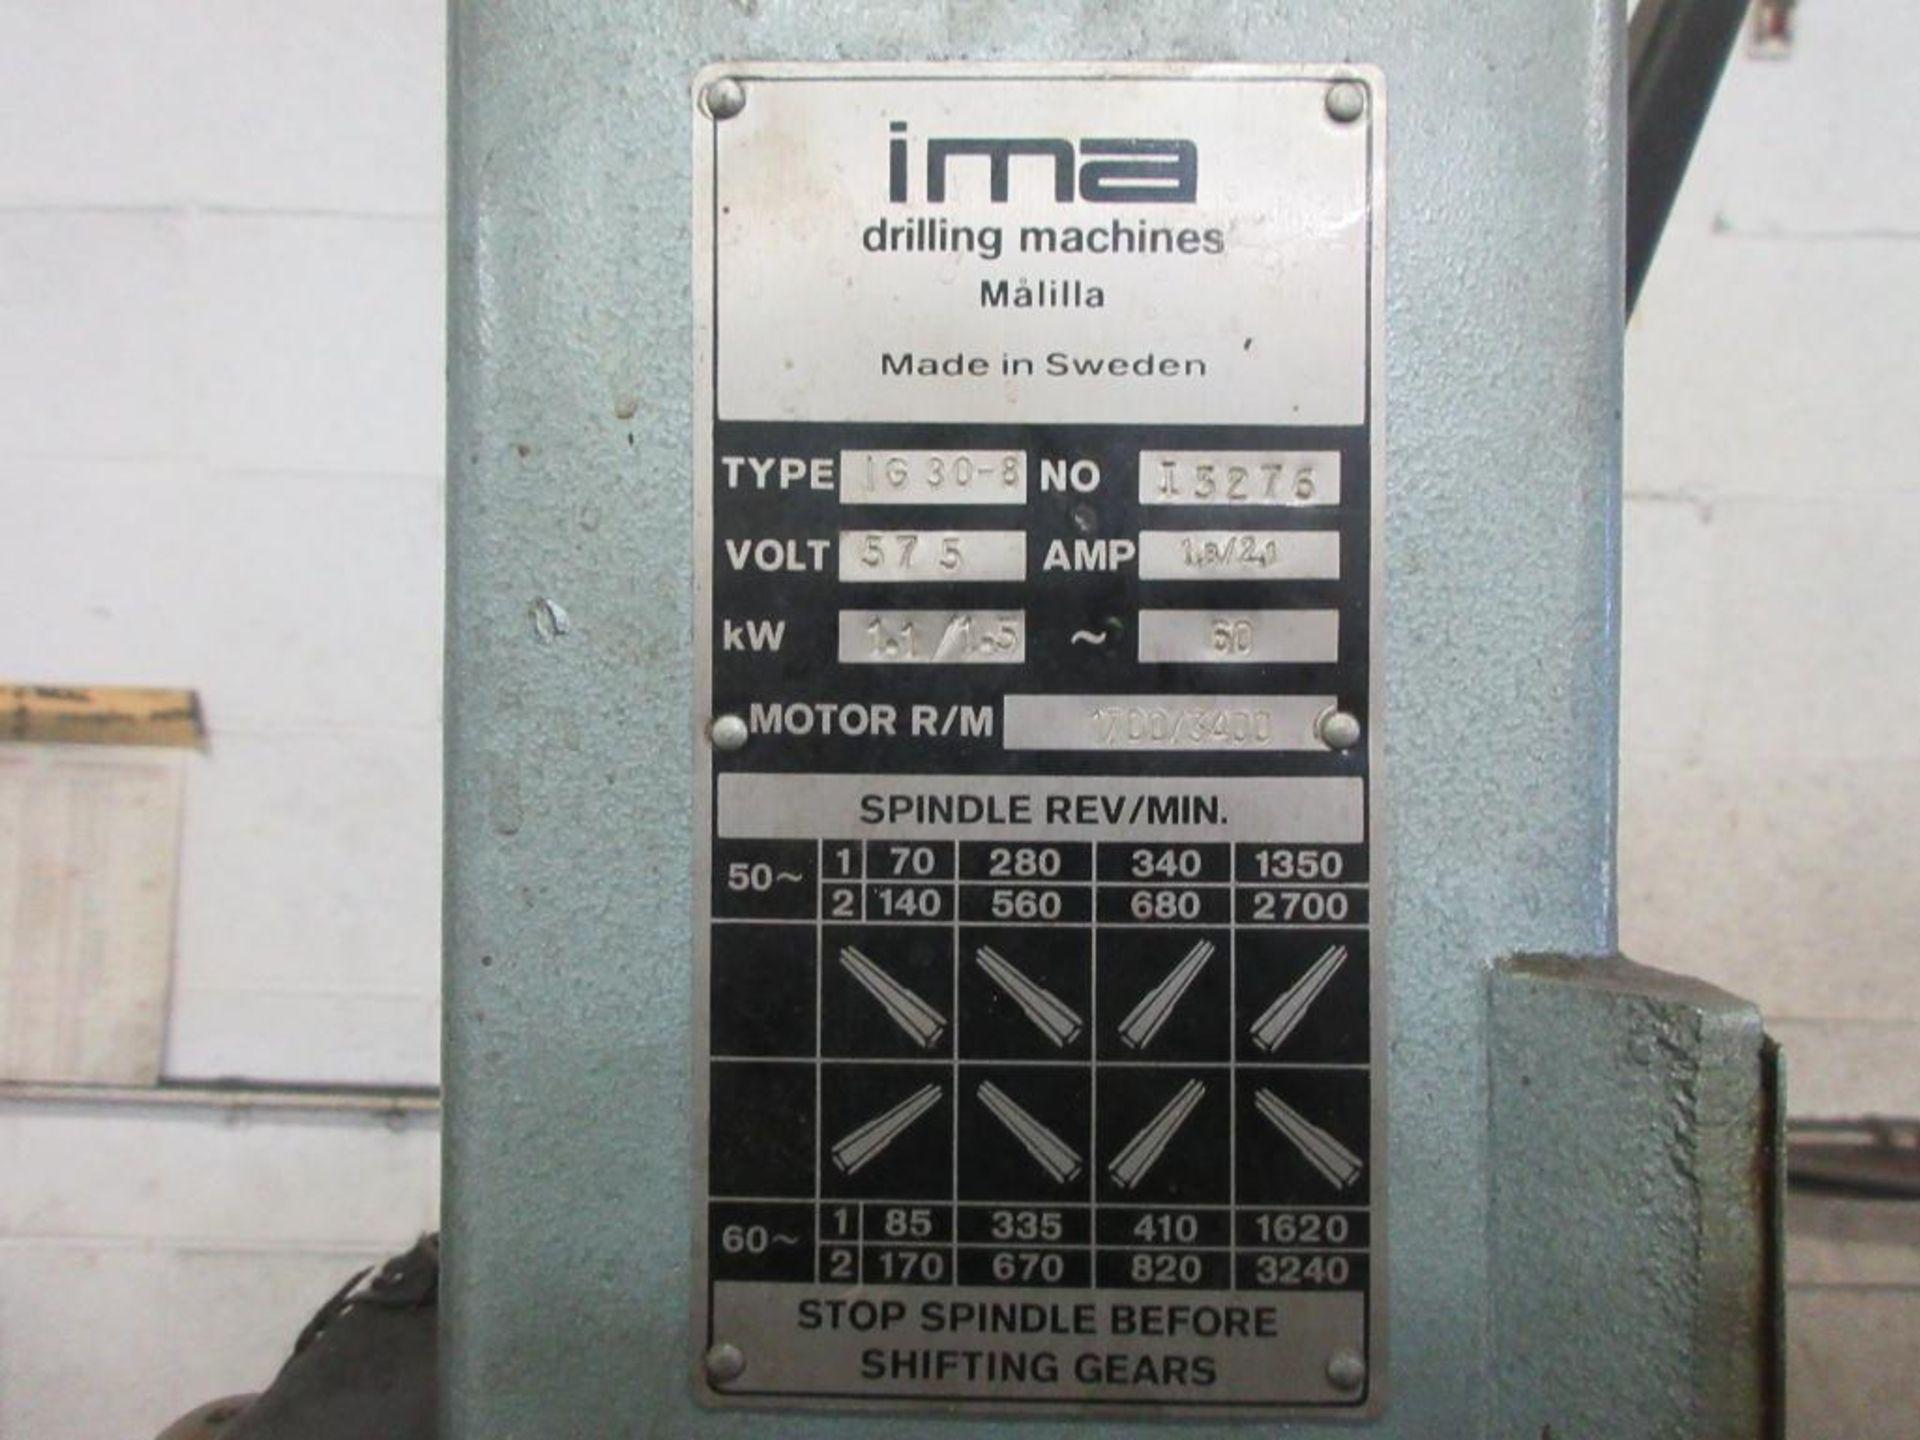 IMA GEARED HEAD DRILL MODEL IG30-8, 1.5 HP, SN I3276 - Image 3 of 3